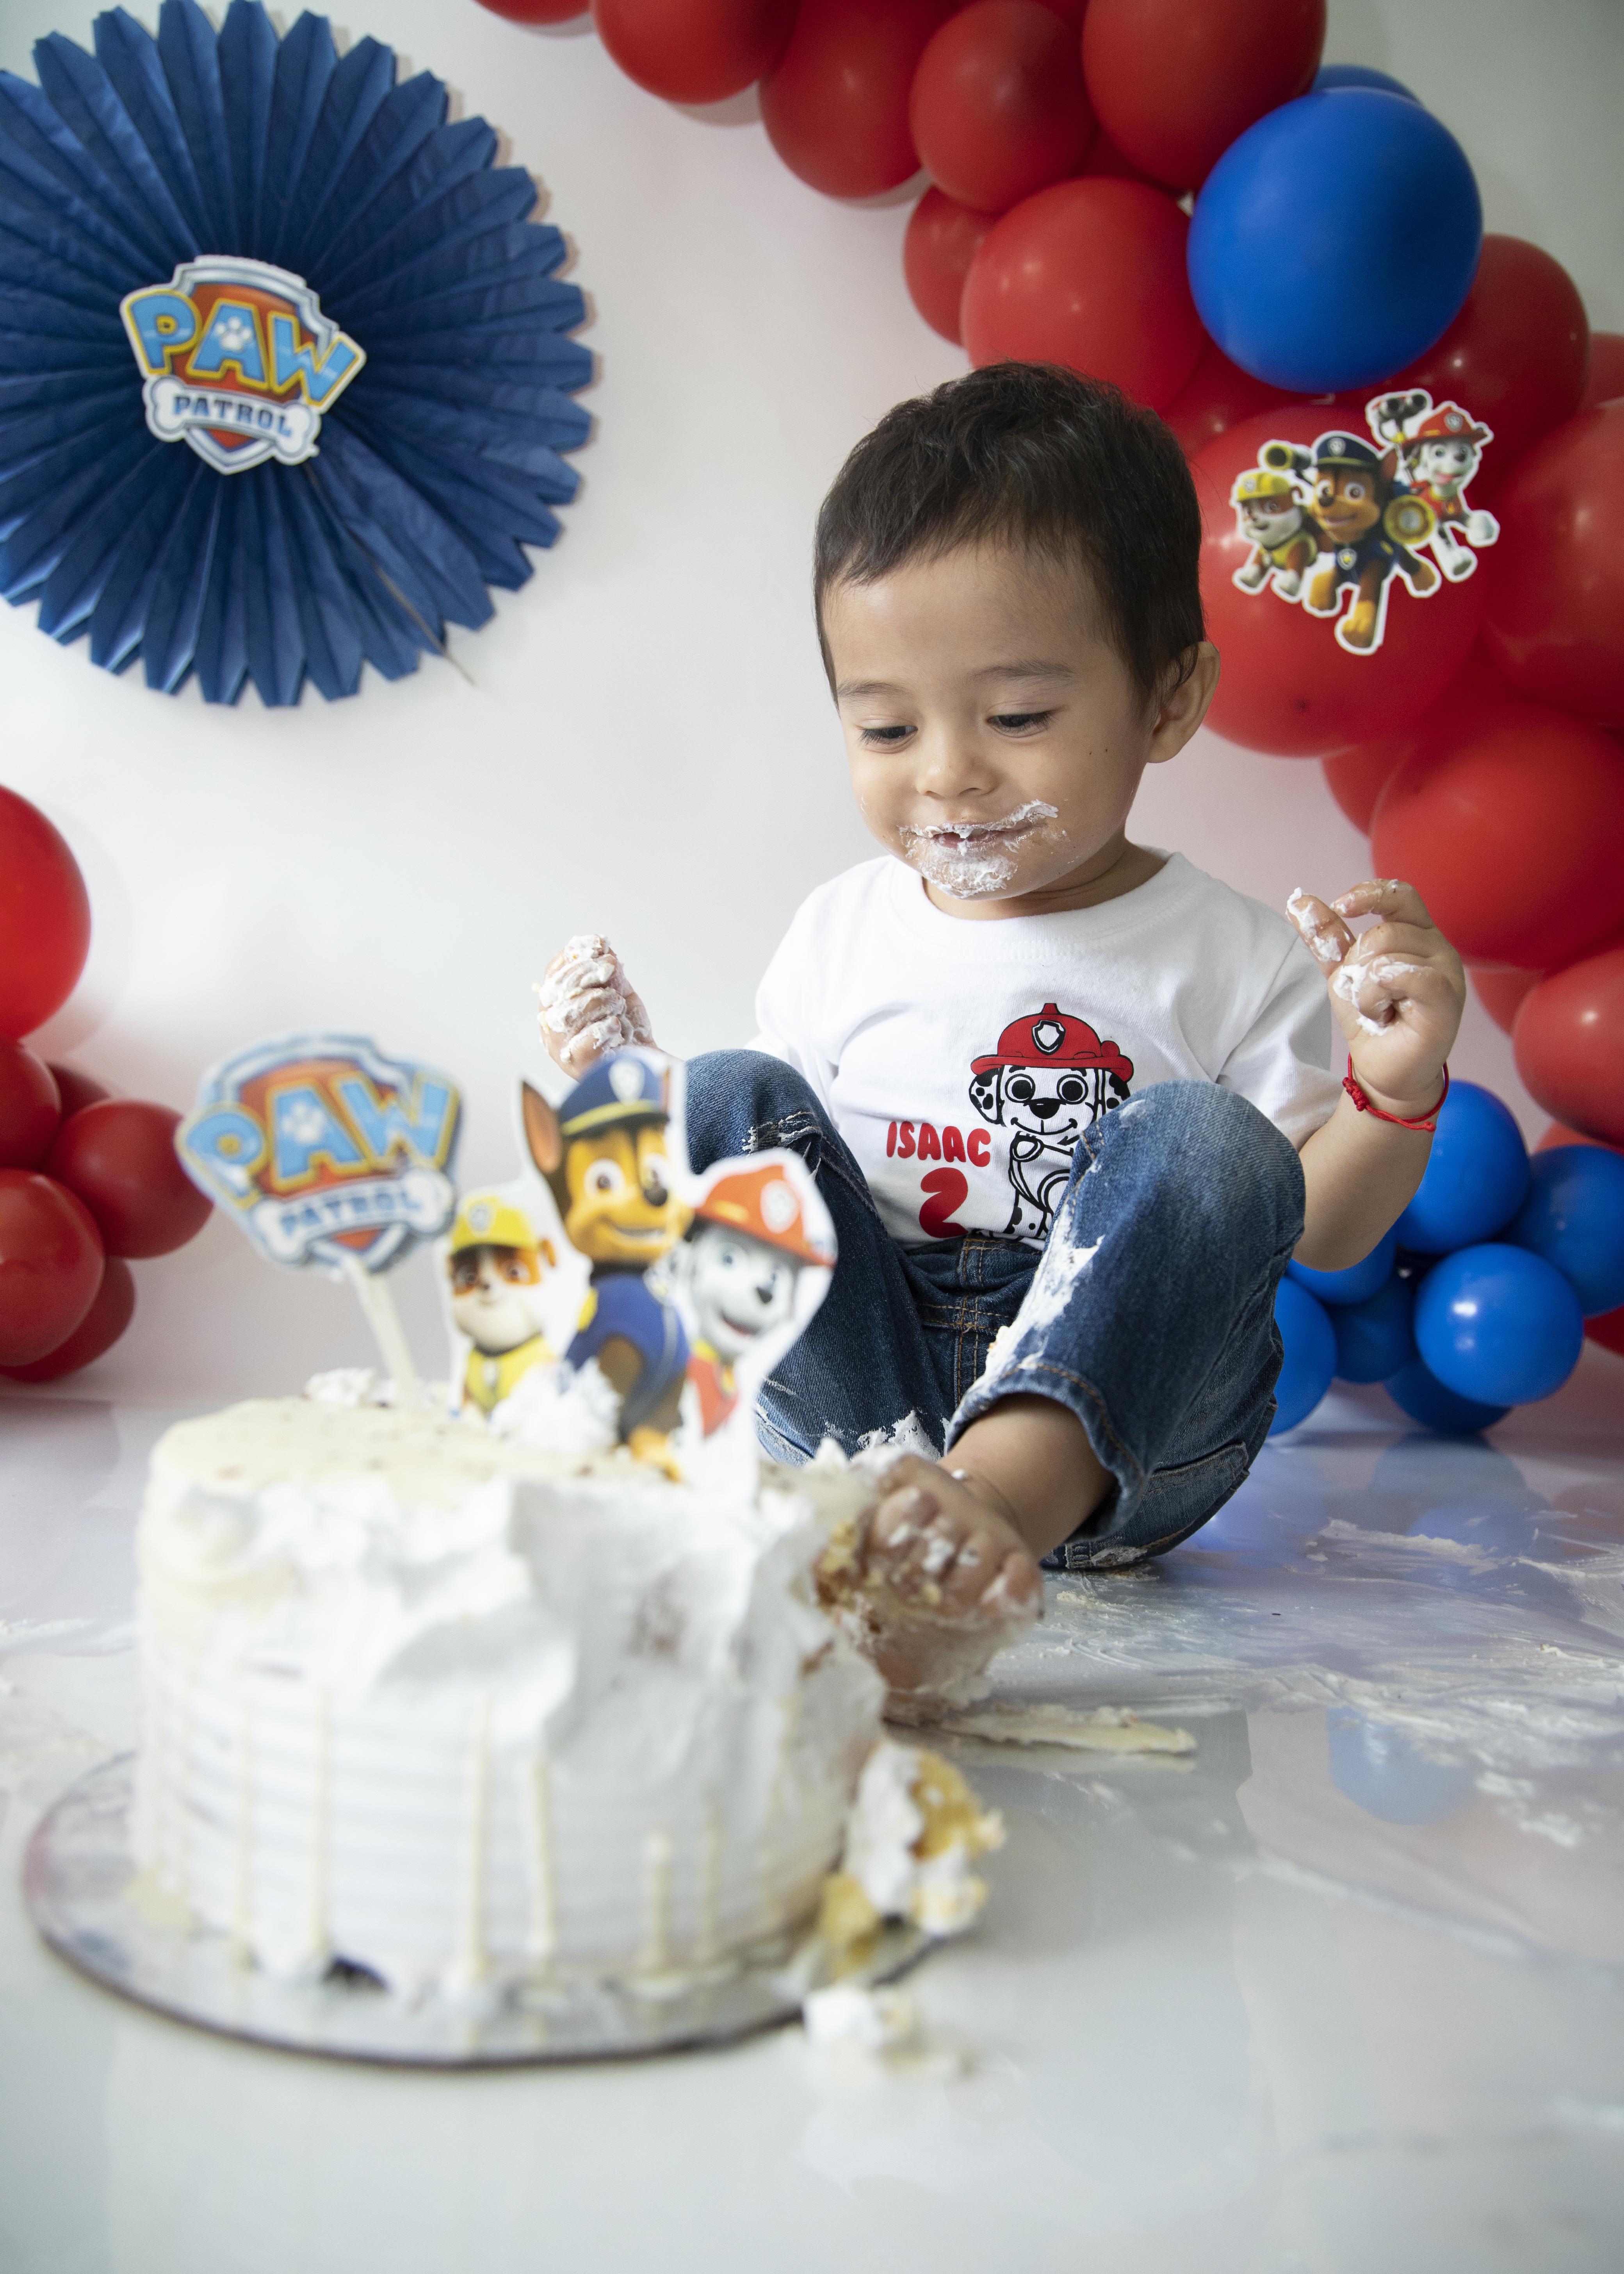 Isaac_cumpleaños_2_imagen282020-15